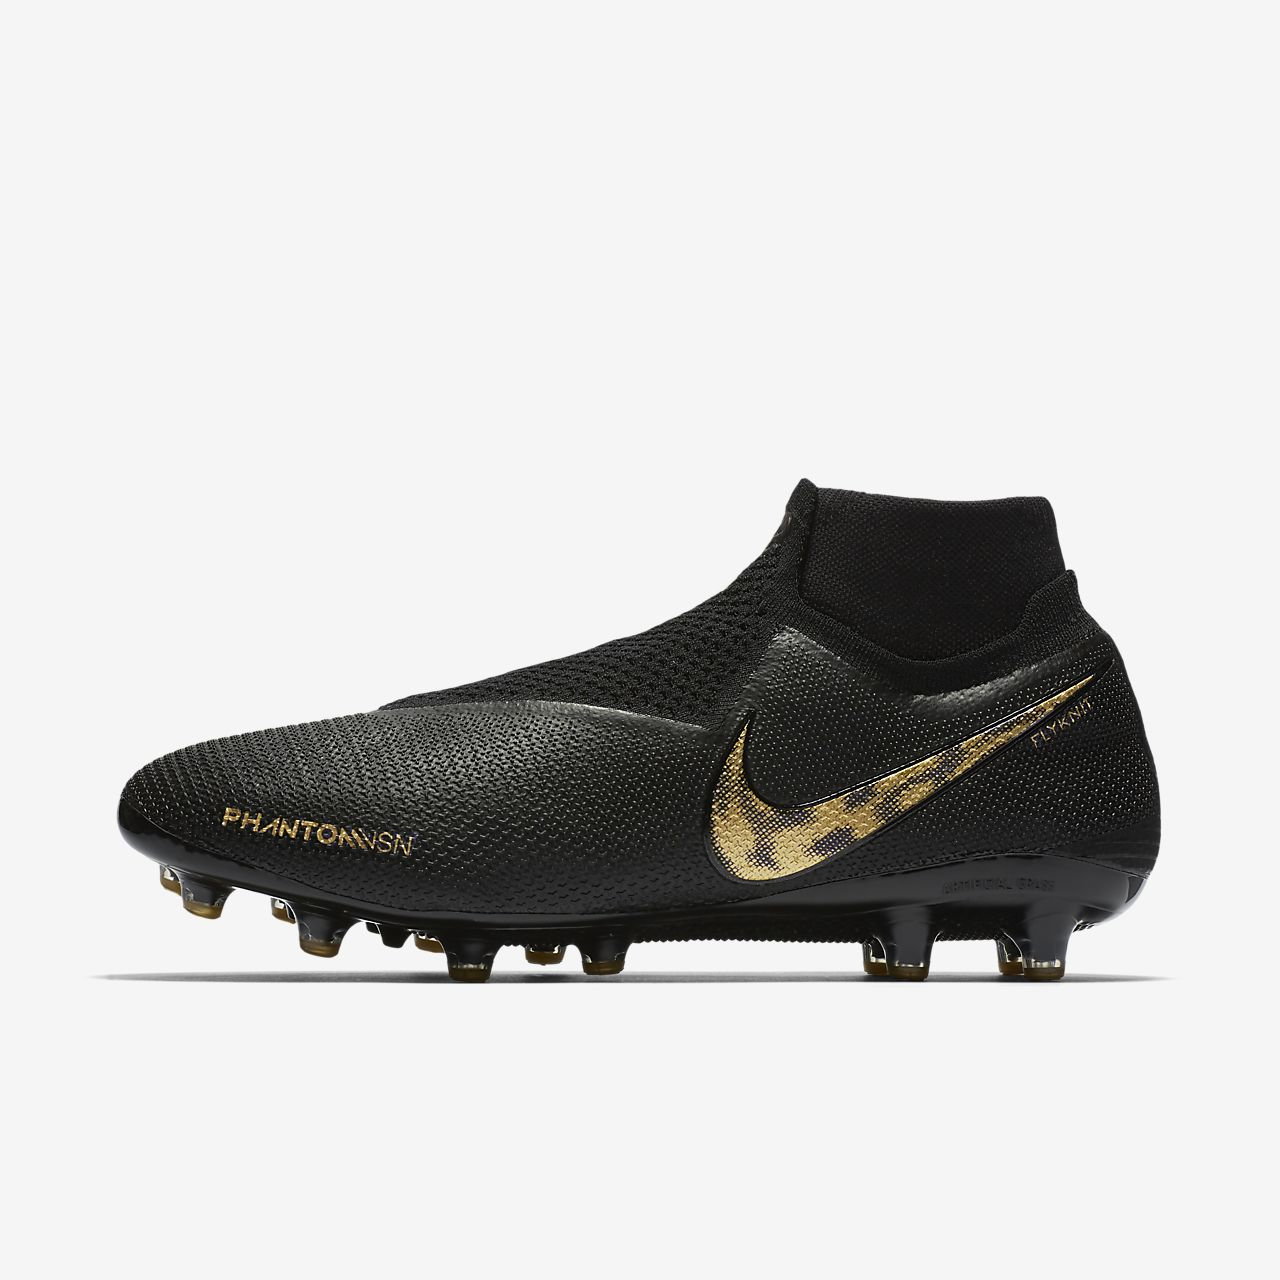 Nike Phantom Vision Elite Dynamic Fit Botas de fútbol para césped artificial